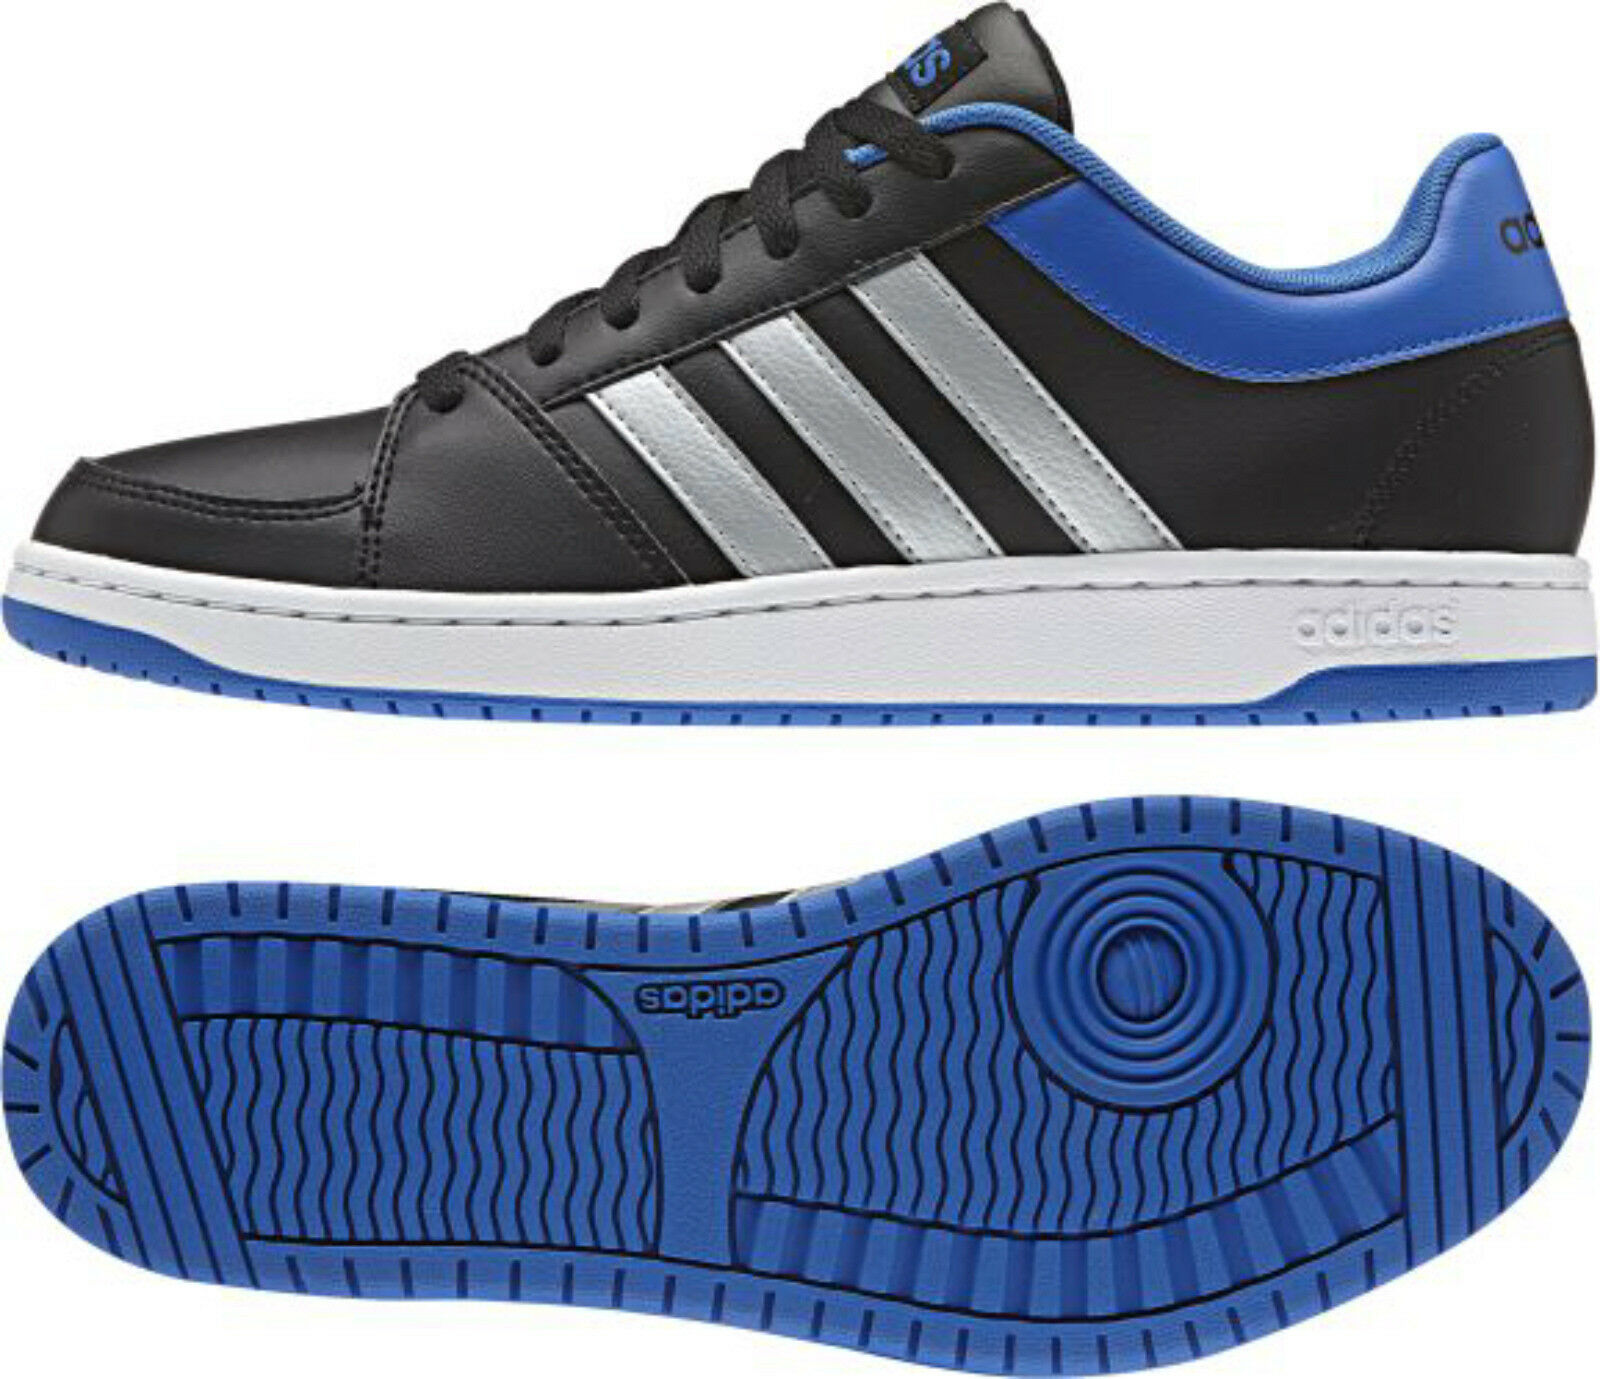 ADIDAS HOOPS VS black/silver/blue  F99533  NEO Sneaker Sportschuhe  =SONDERPREIS